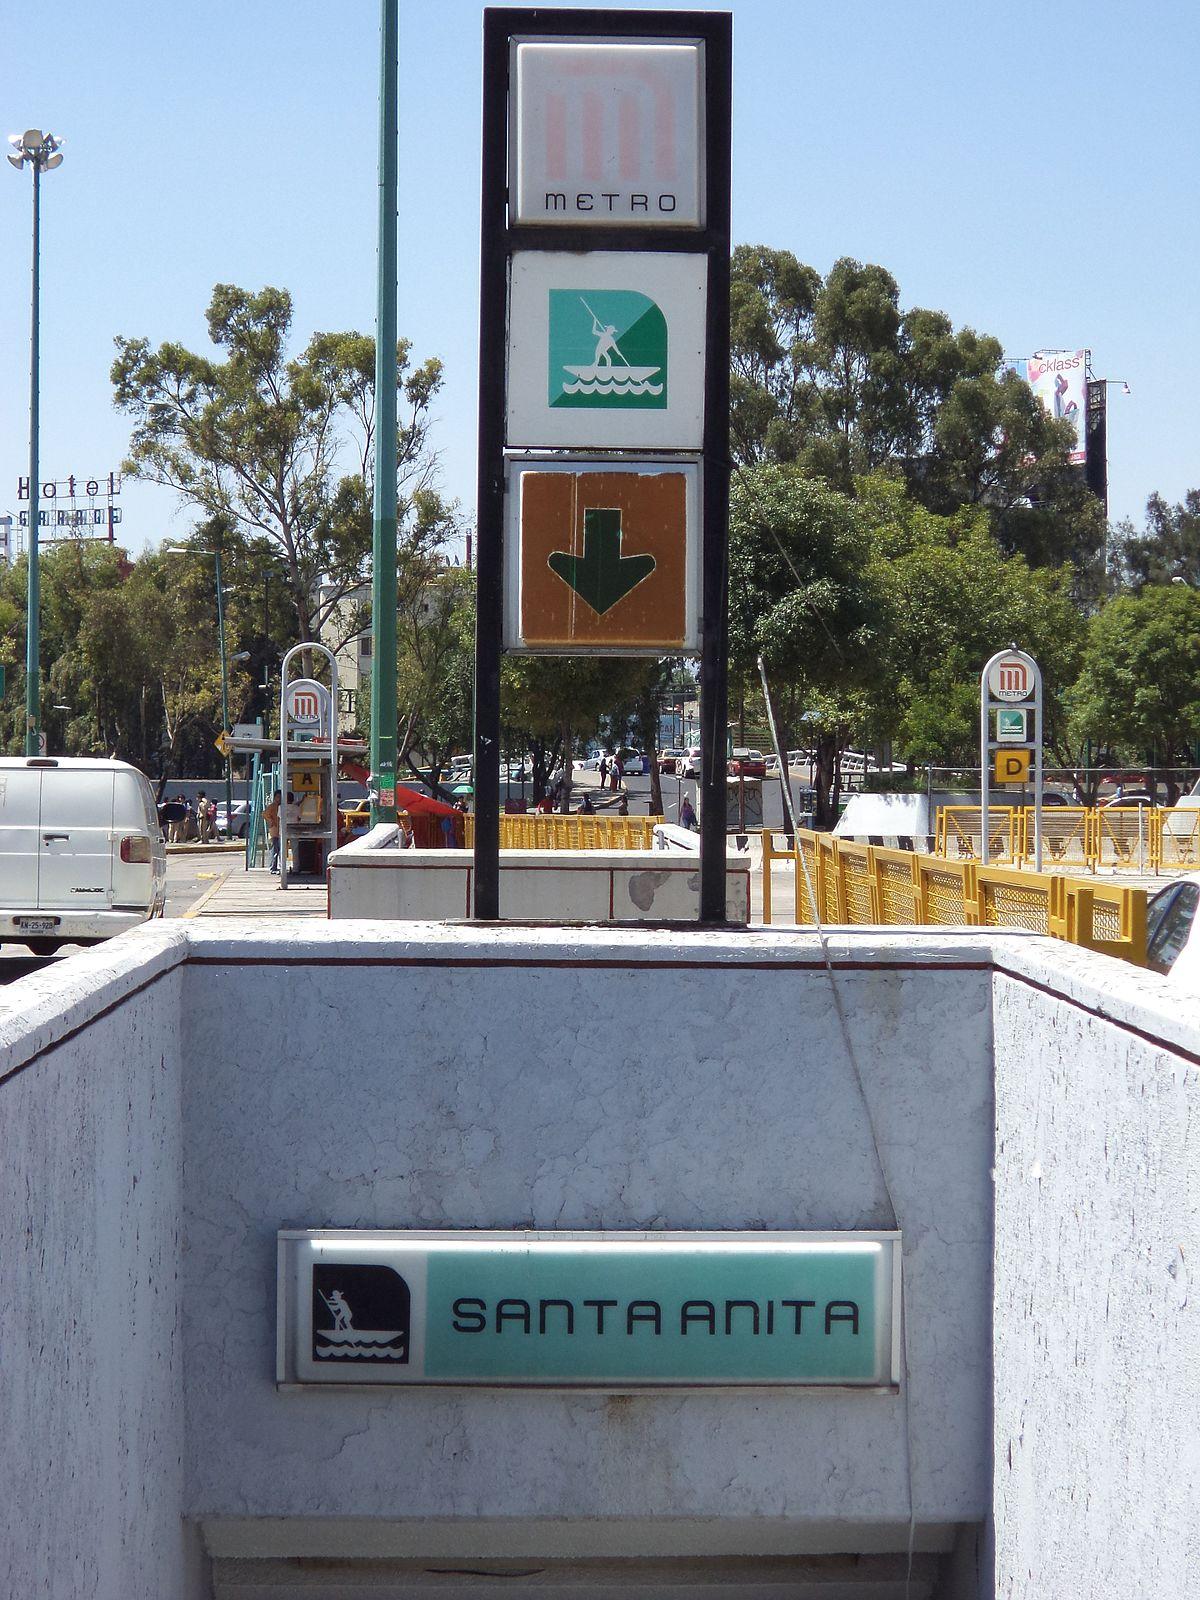 Santa Anita Estaci 243 N Wikipedia La Enciclopedia Libre